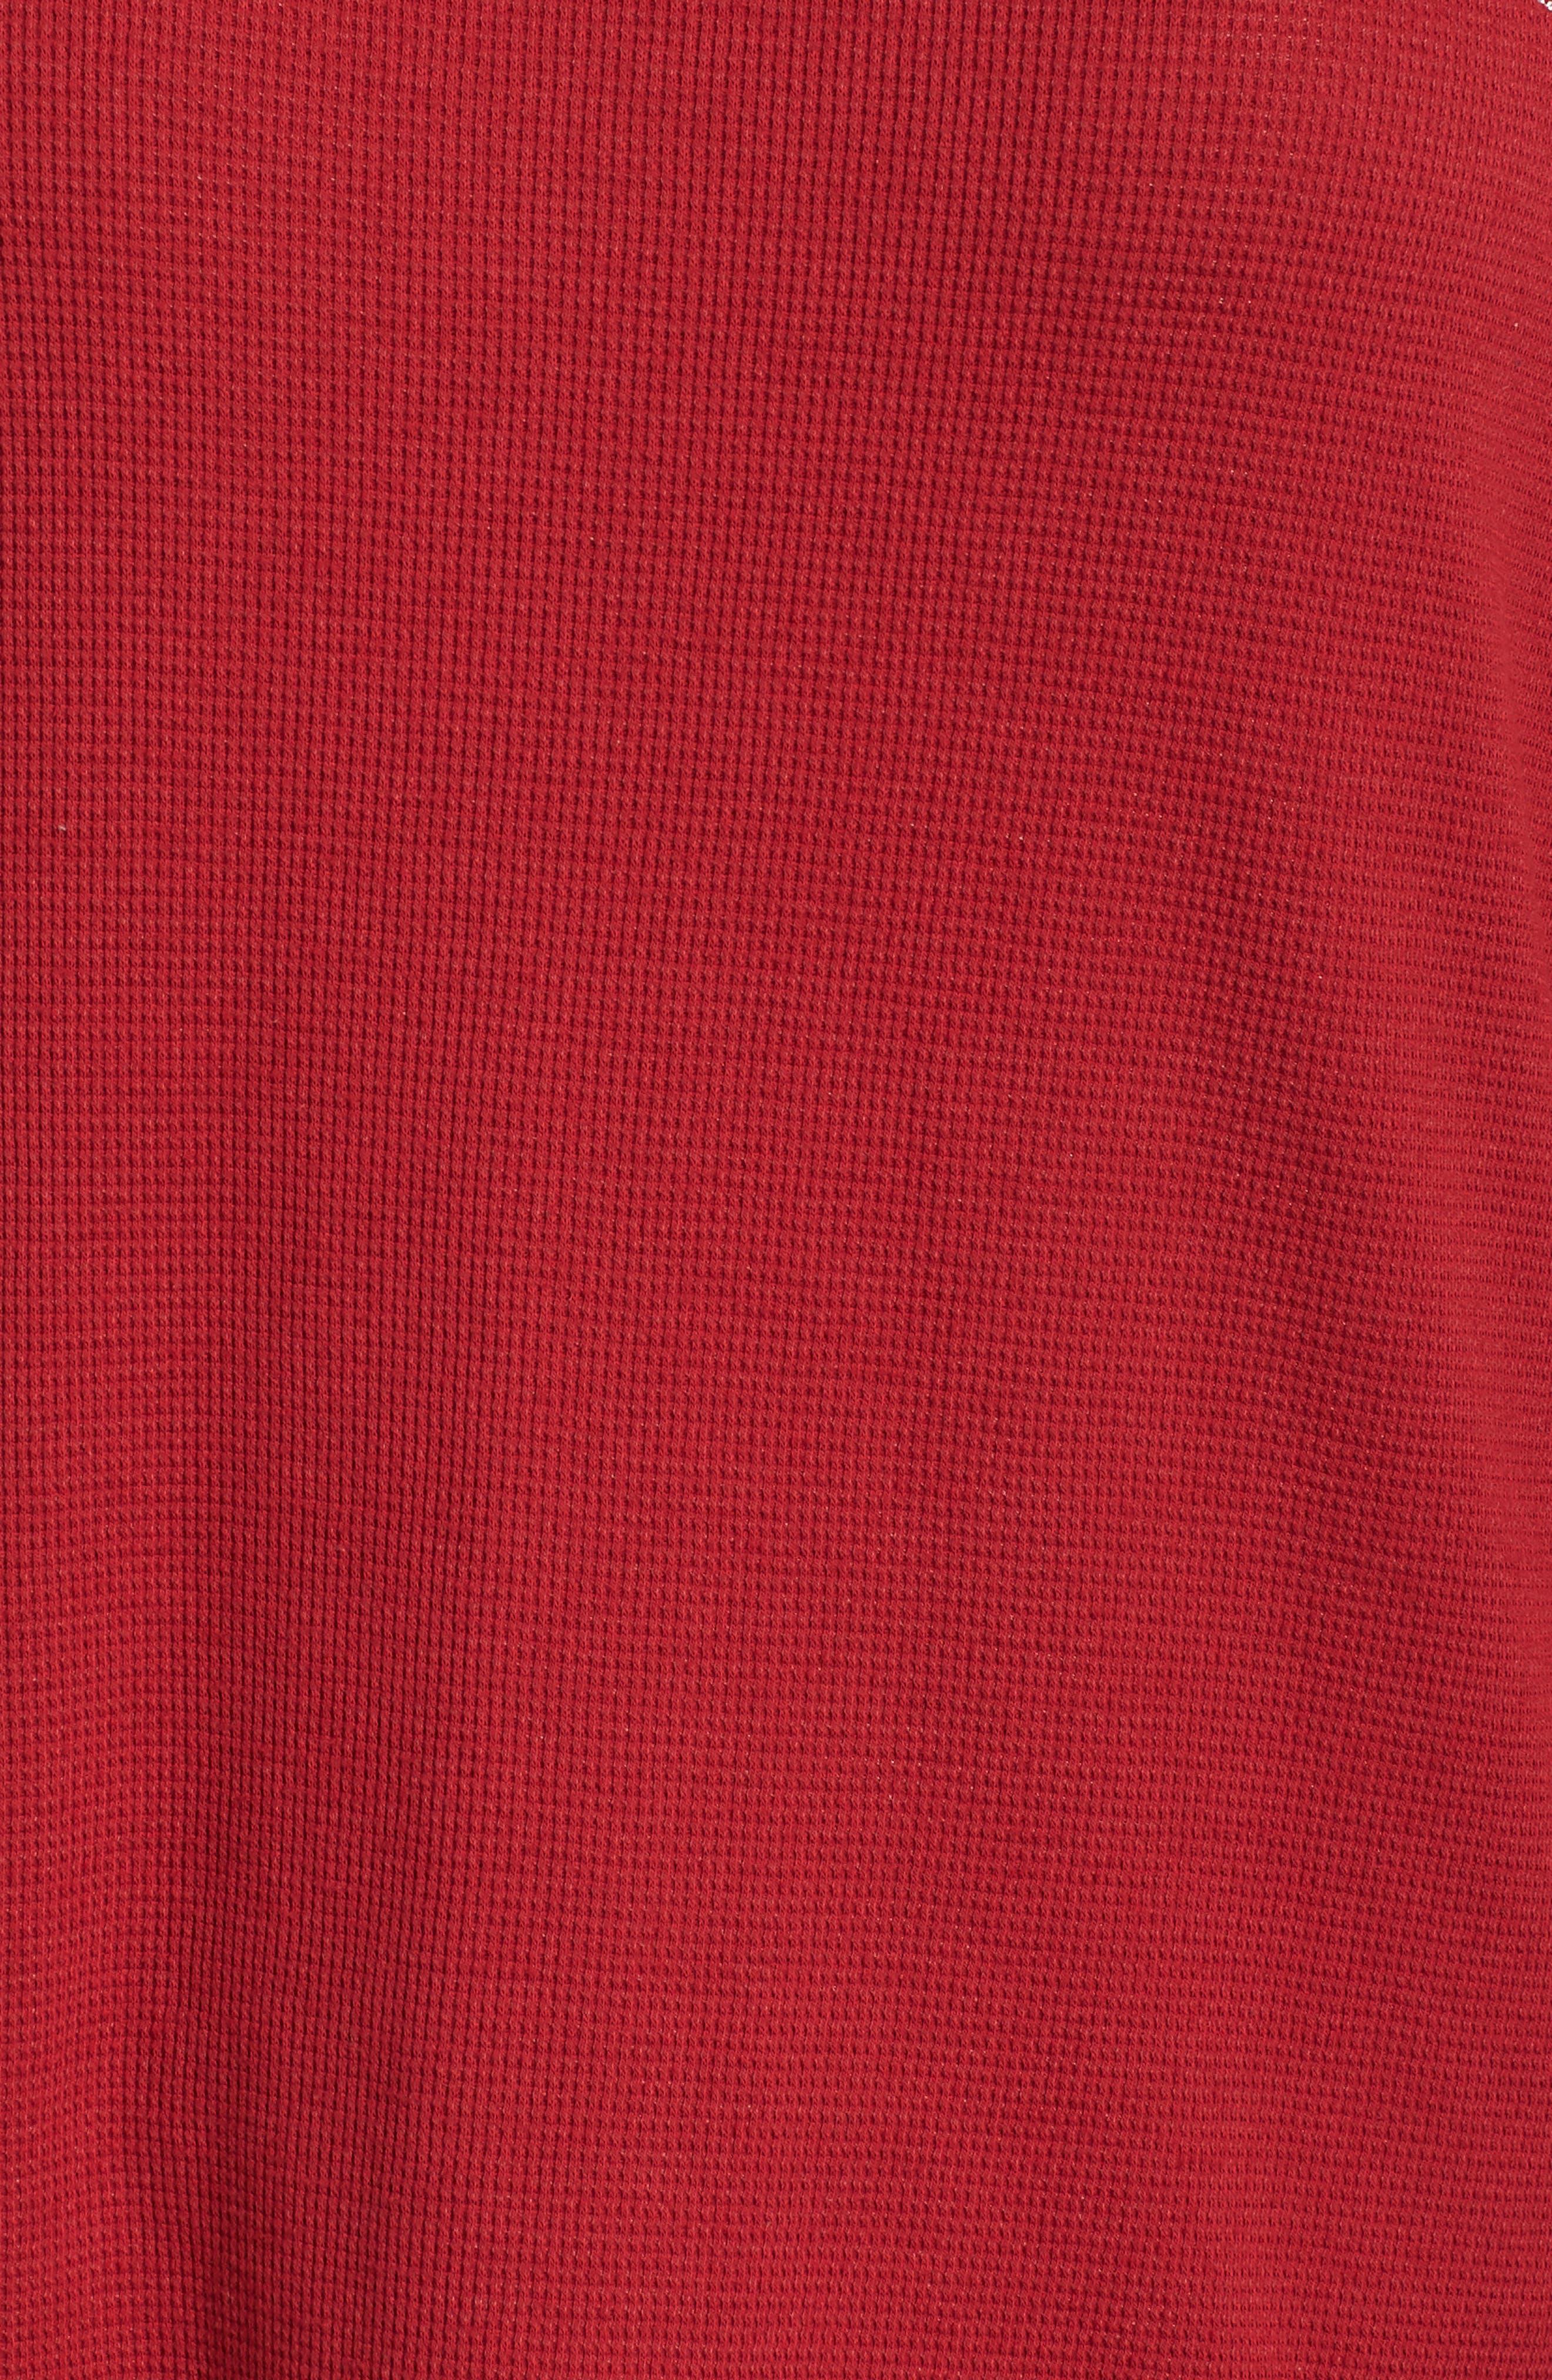 Thermal Pajamas,                             Alternate thumbnail 5, color,                             001